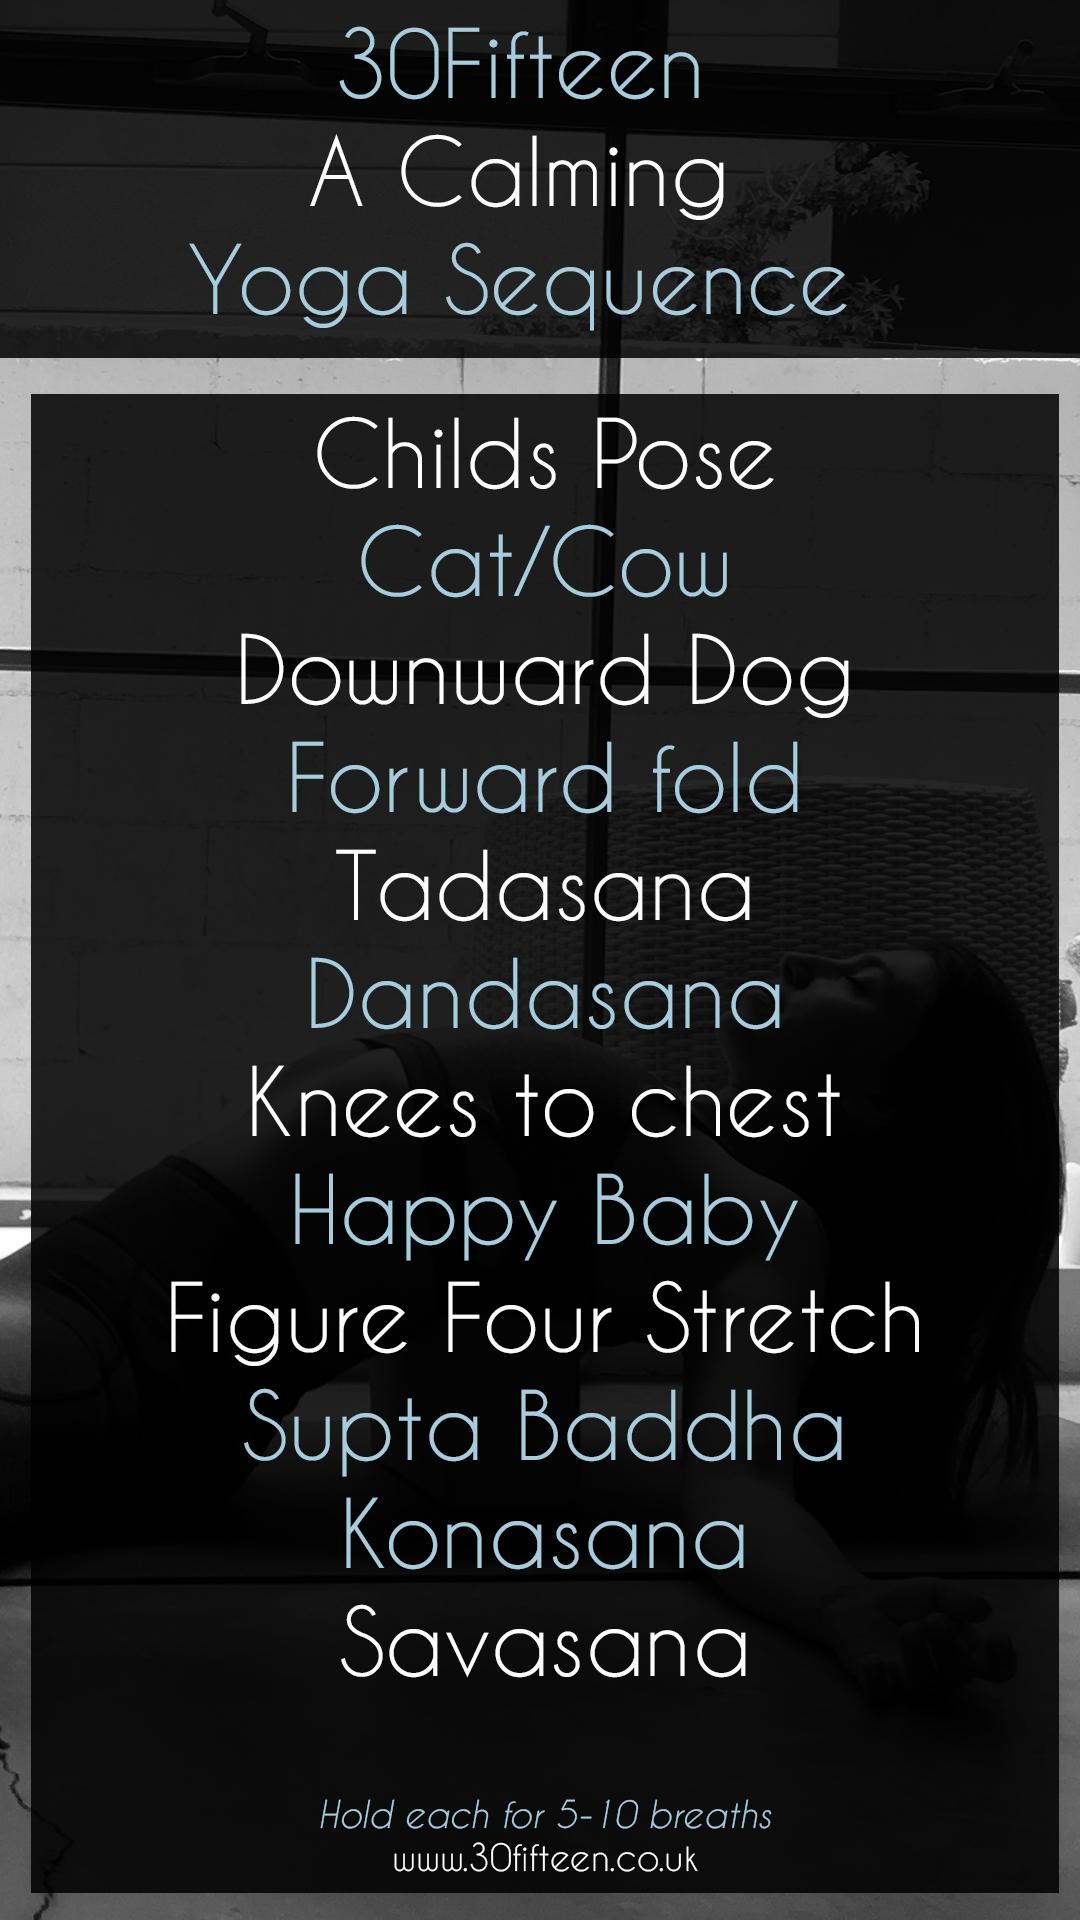 30Fifteen Calming Yoga Sequence.jpg